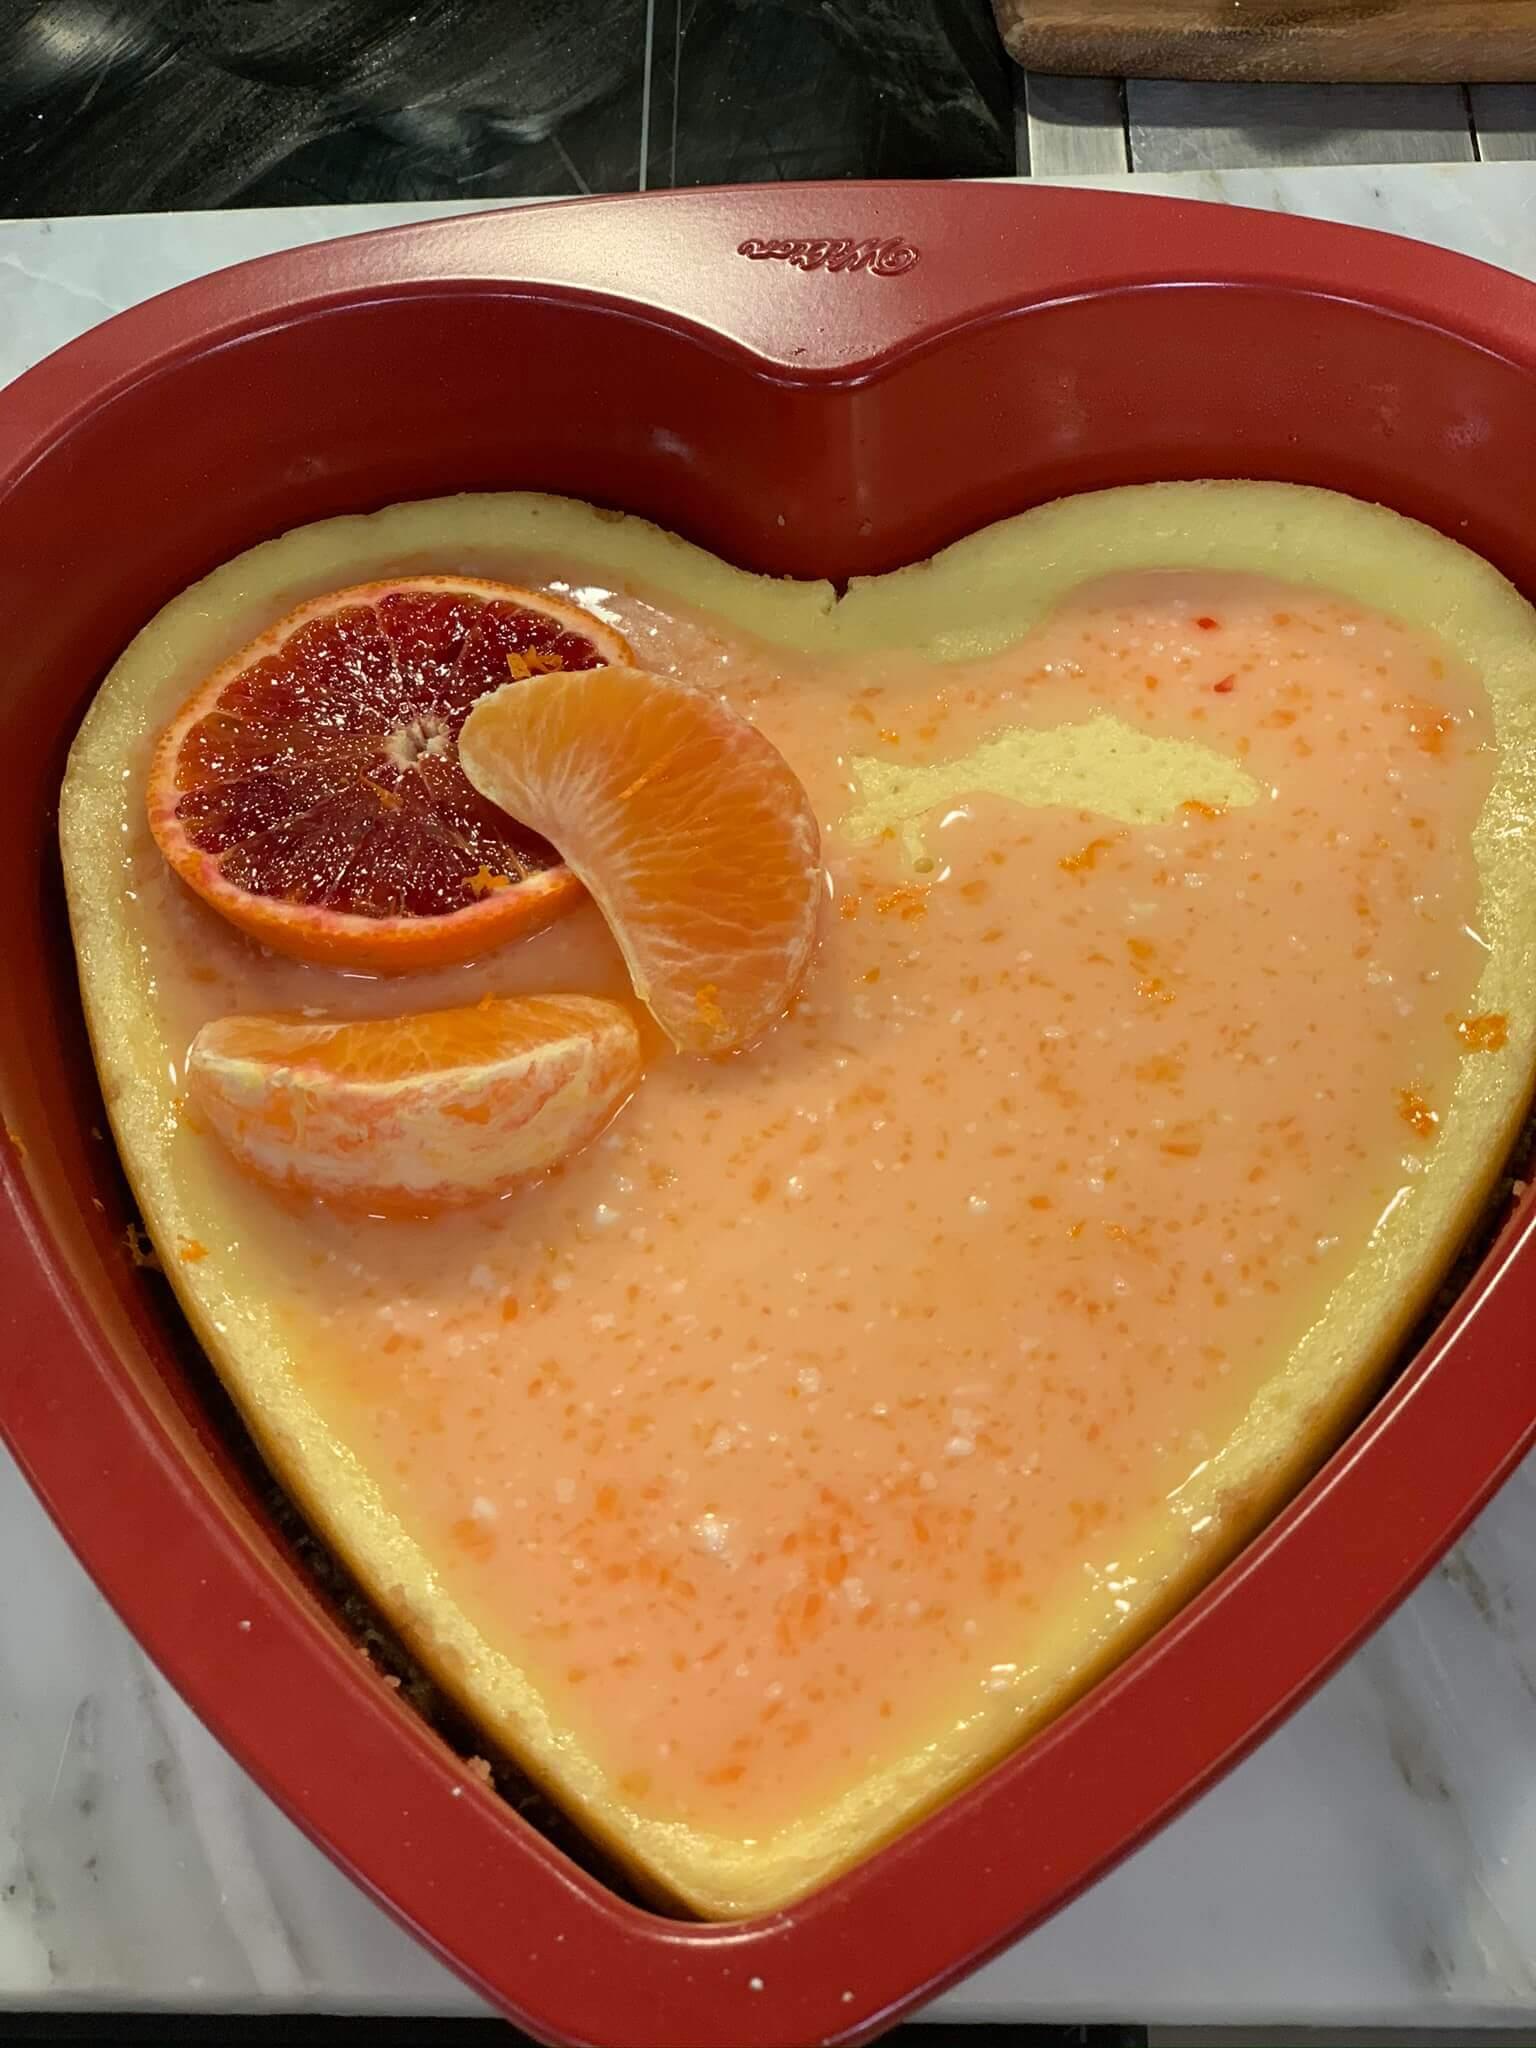 Valentine's Day Recipes: MandaRosa Cheesecake + Grand Marnier Glaze